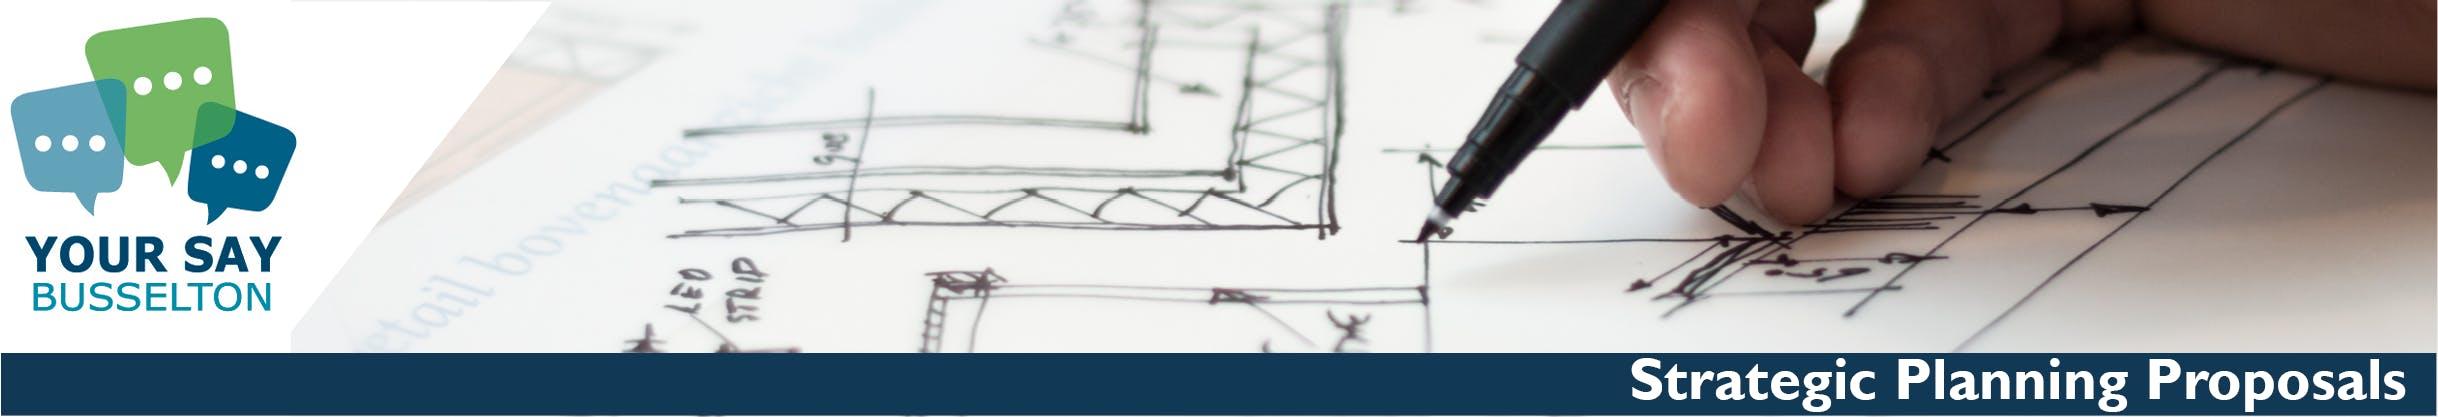 Strategic Planning Proposal Banner Image